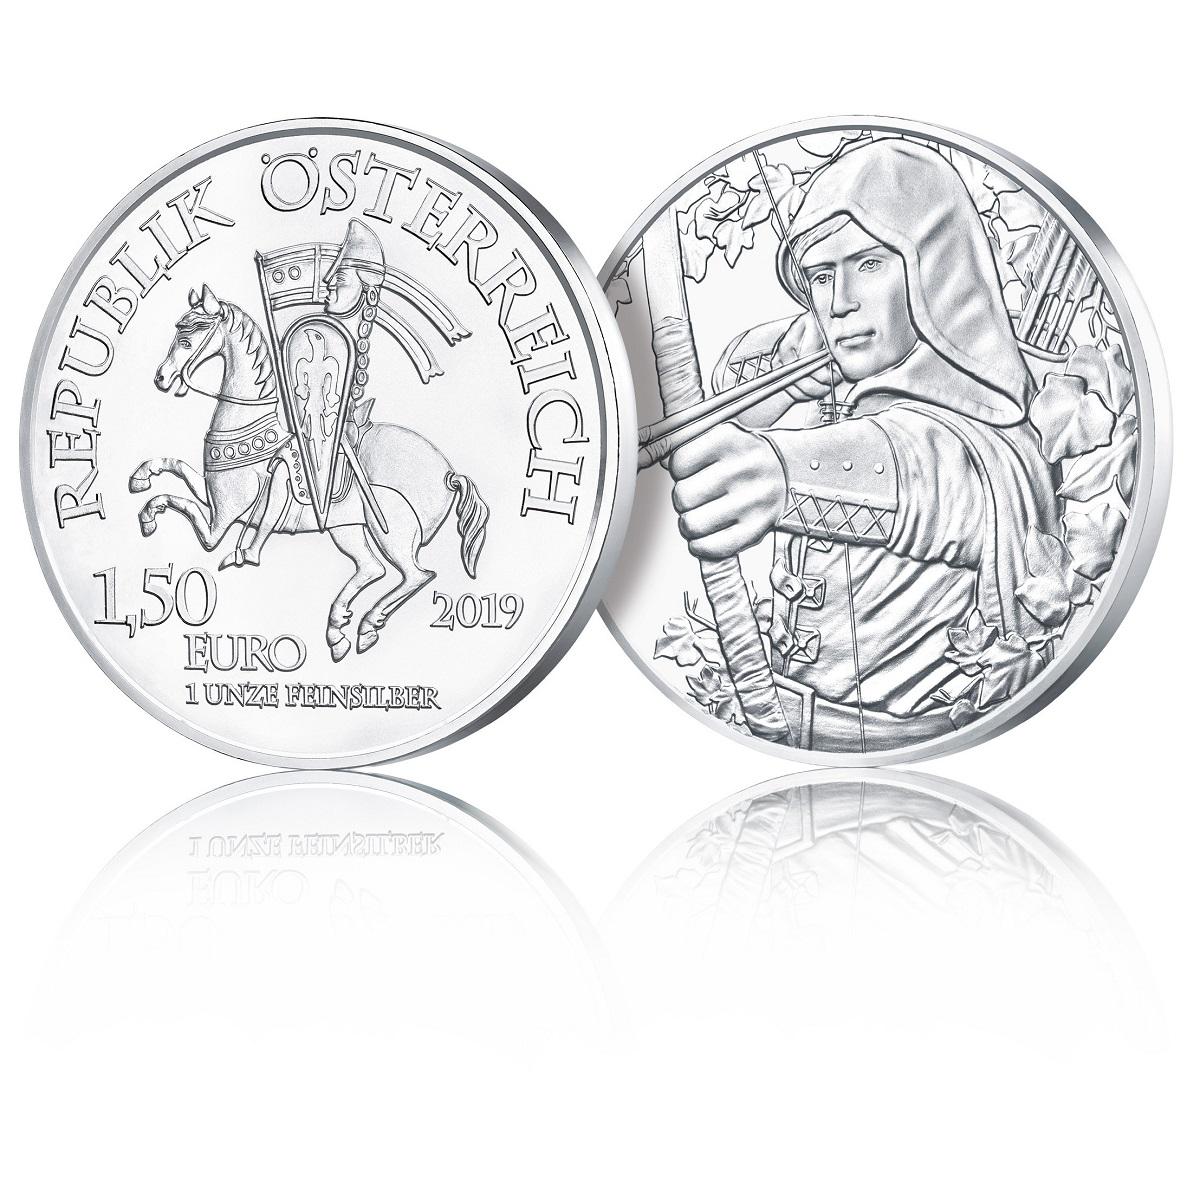 1,50 euro Austria 2019 1 ounce silver - Robin Hood (zoom)